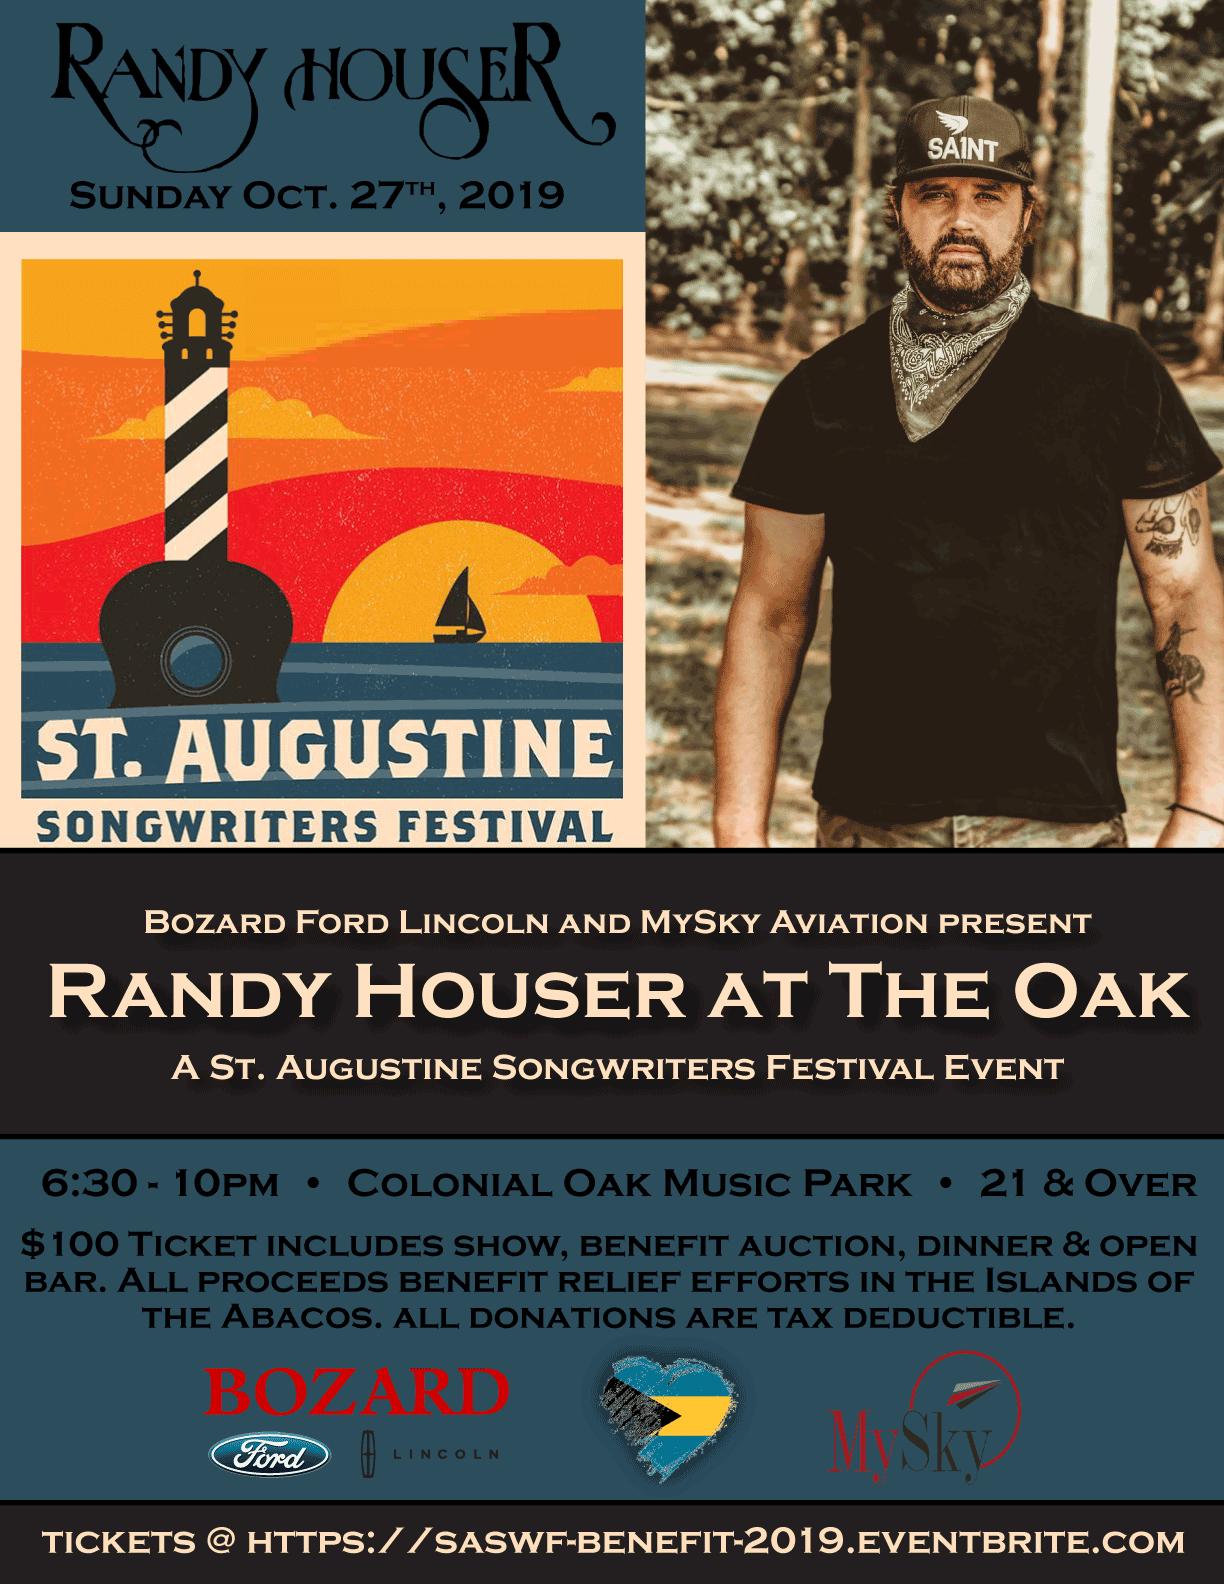 Randy Houser at The Oak